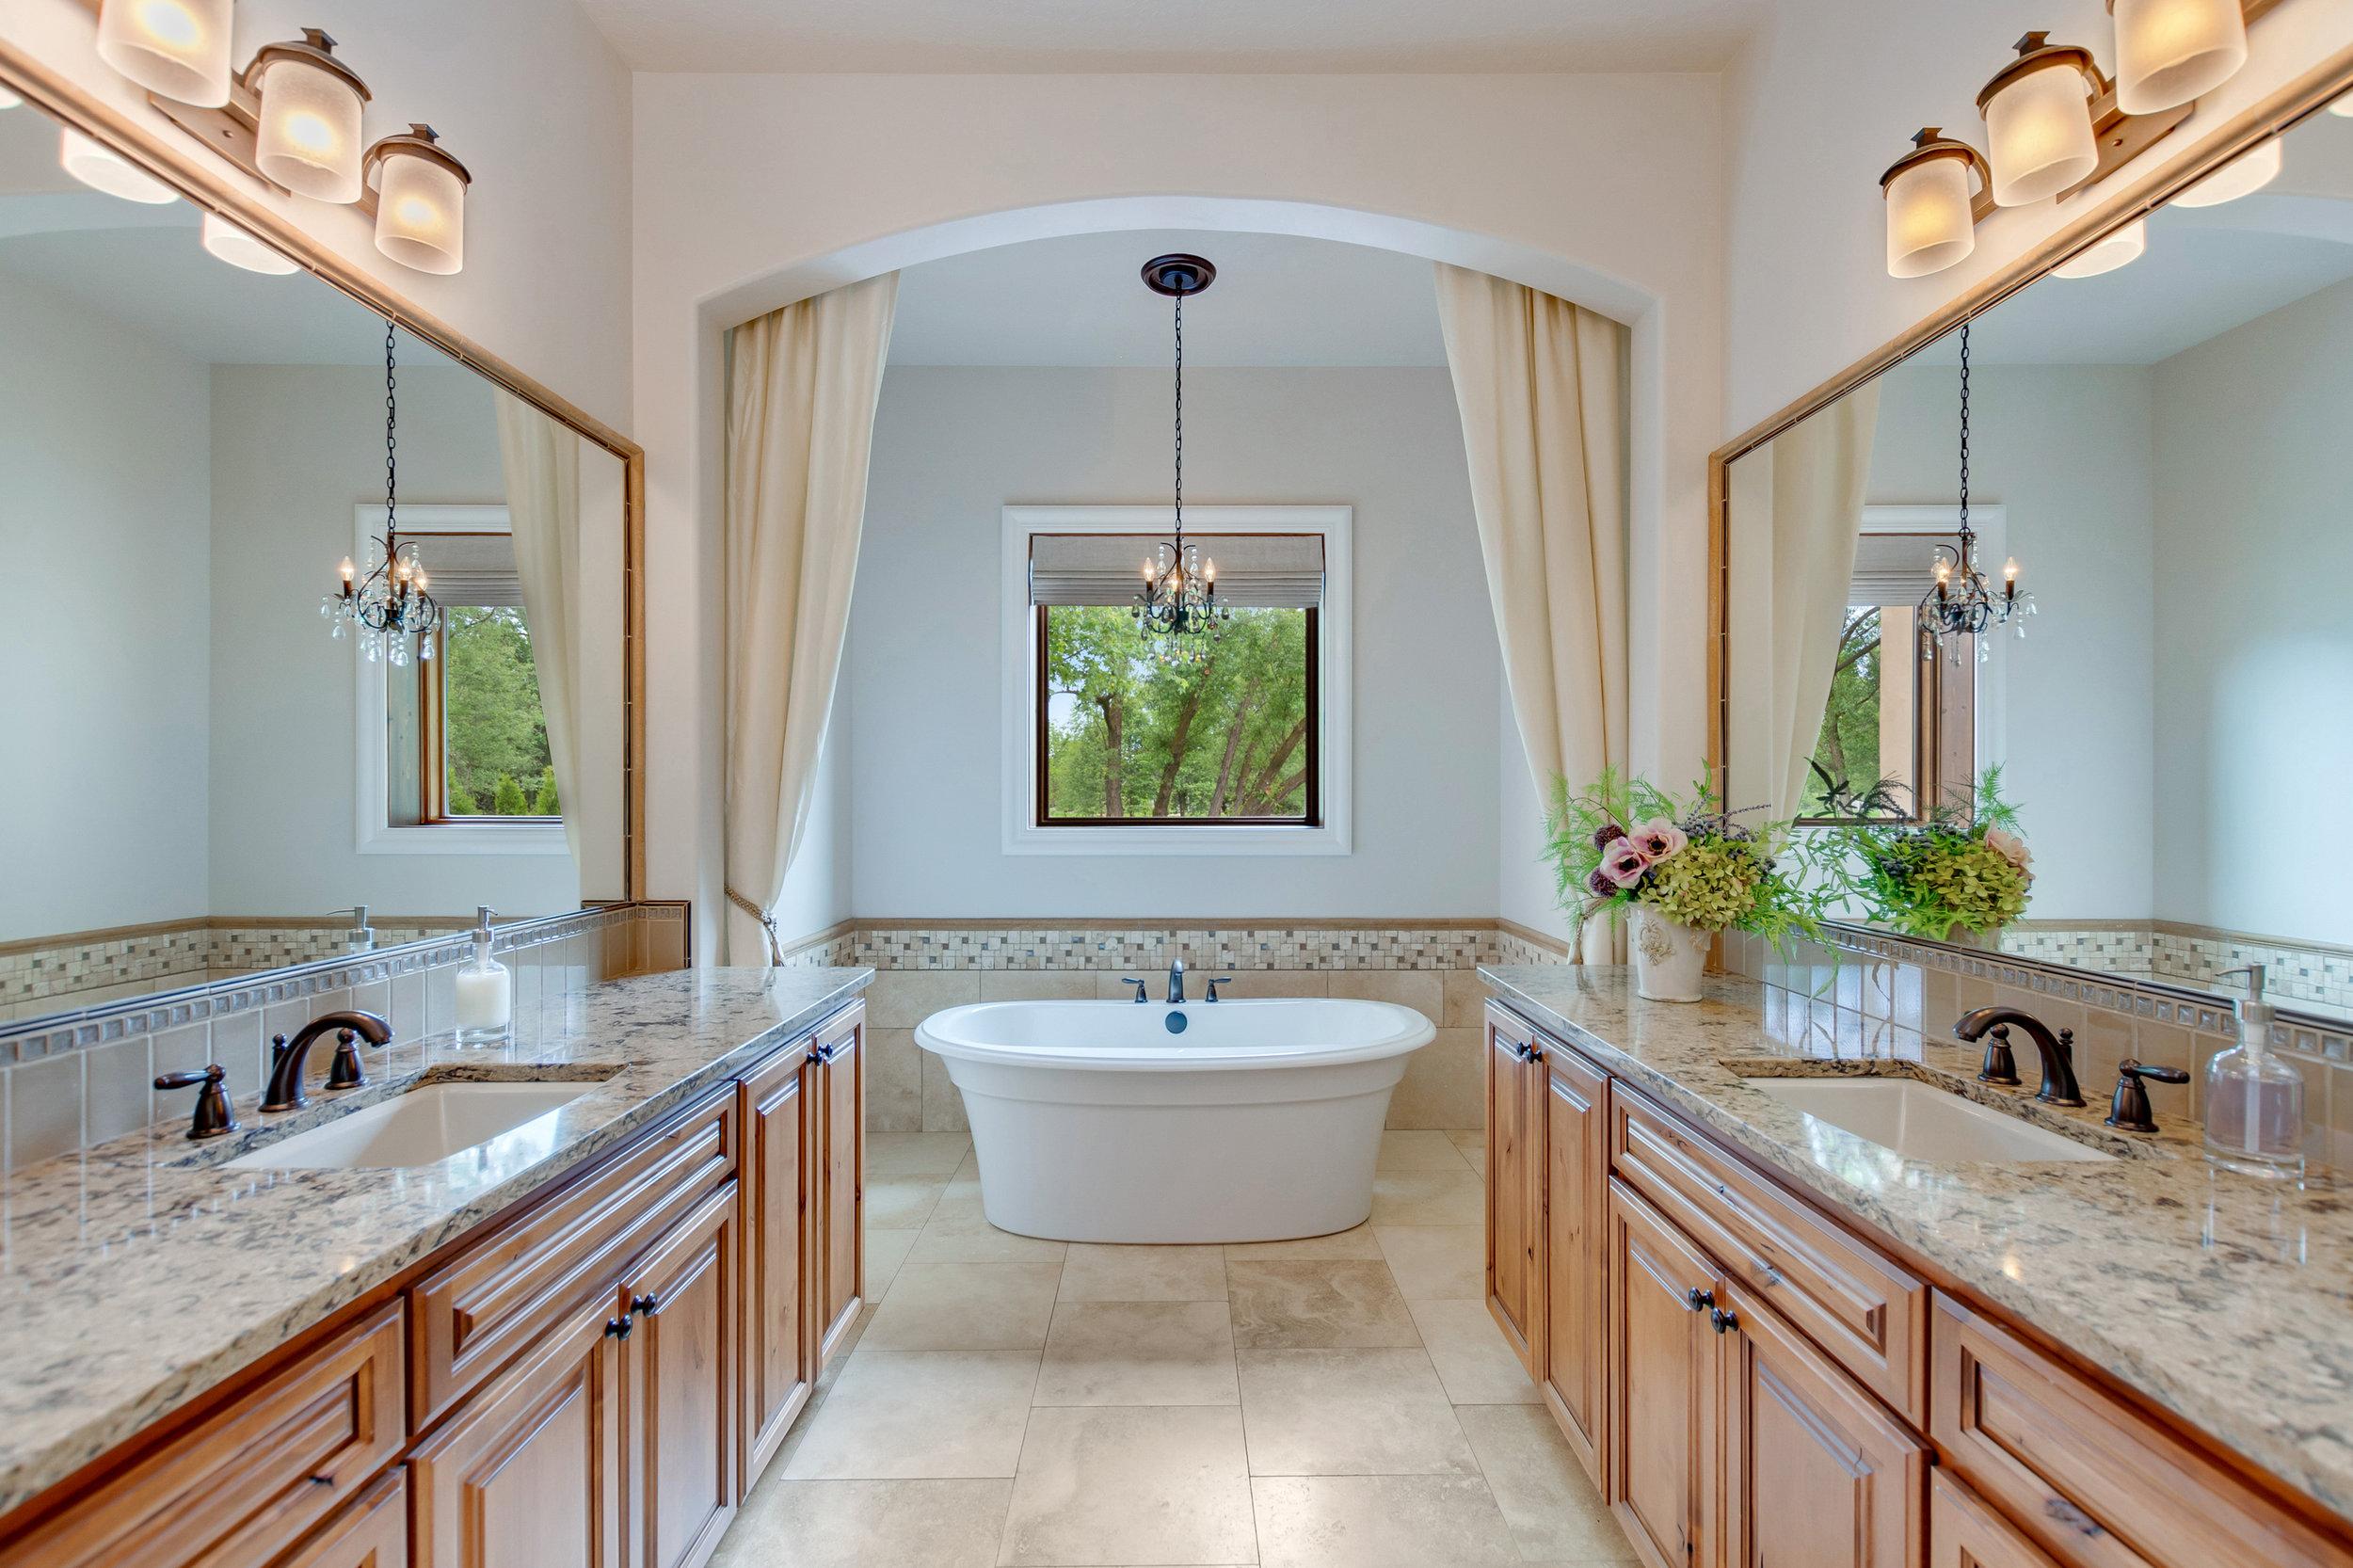 54-Master Bathroom.jpg